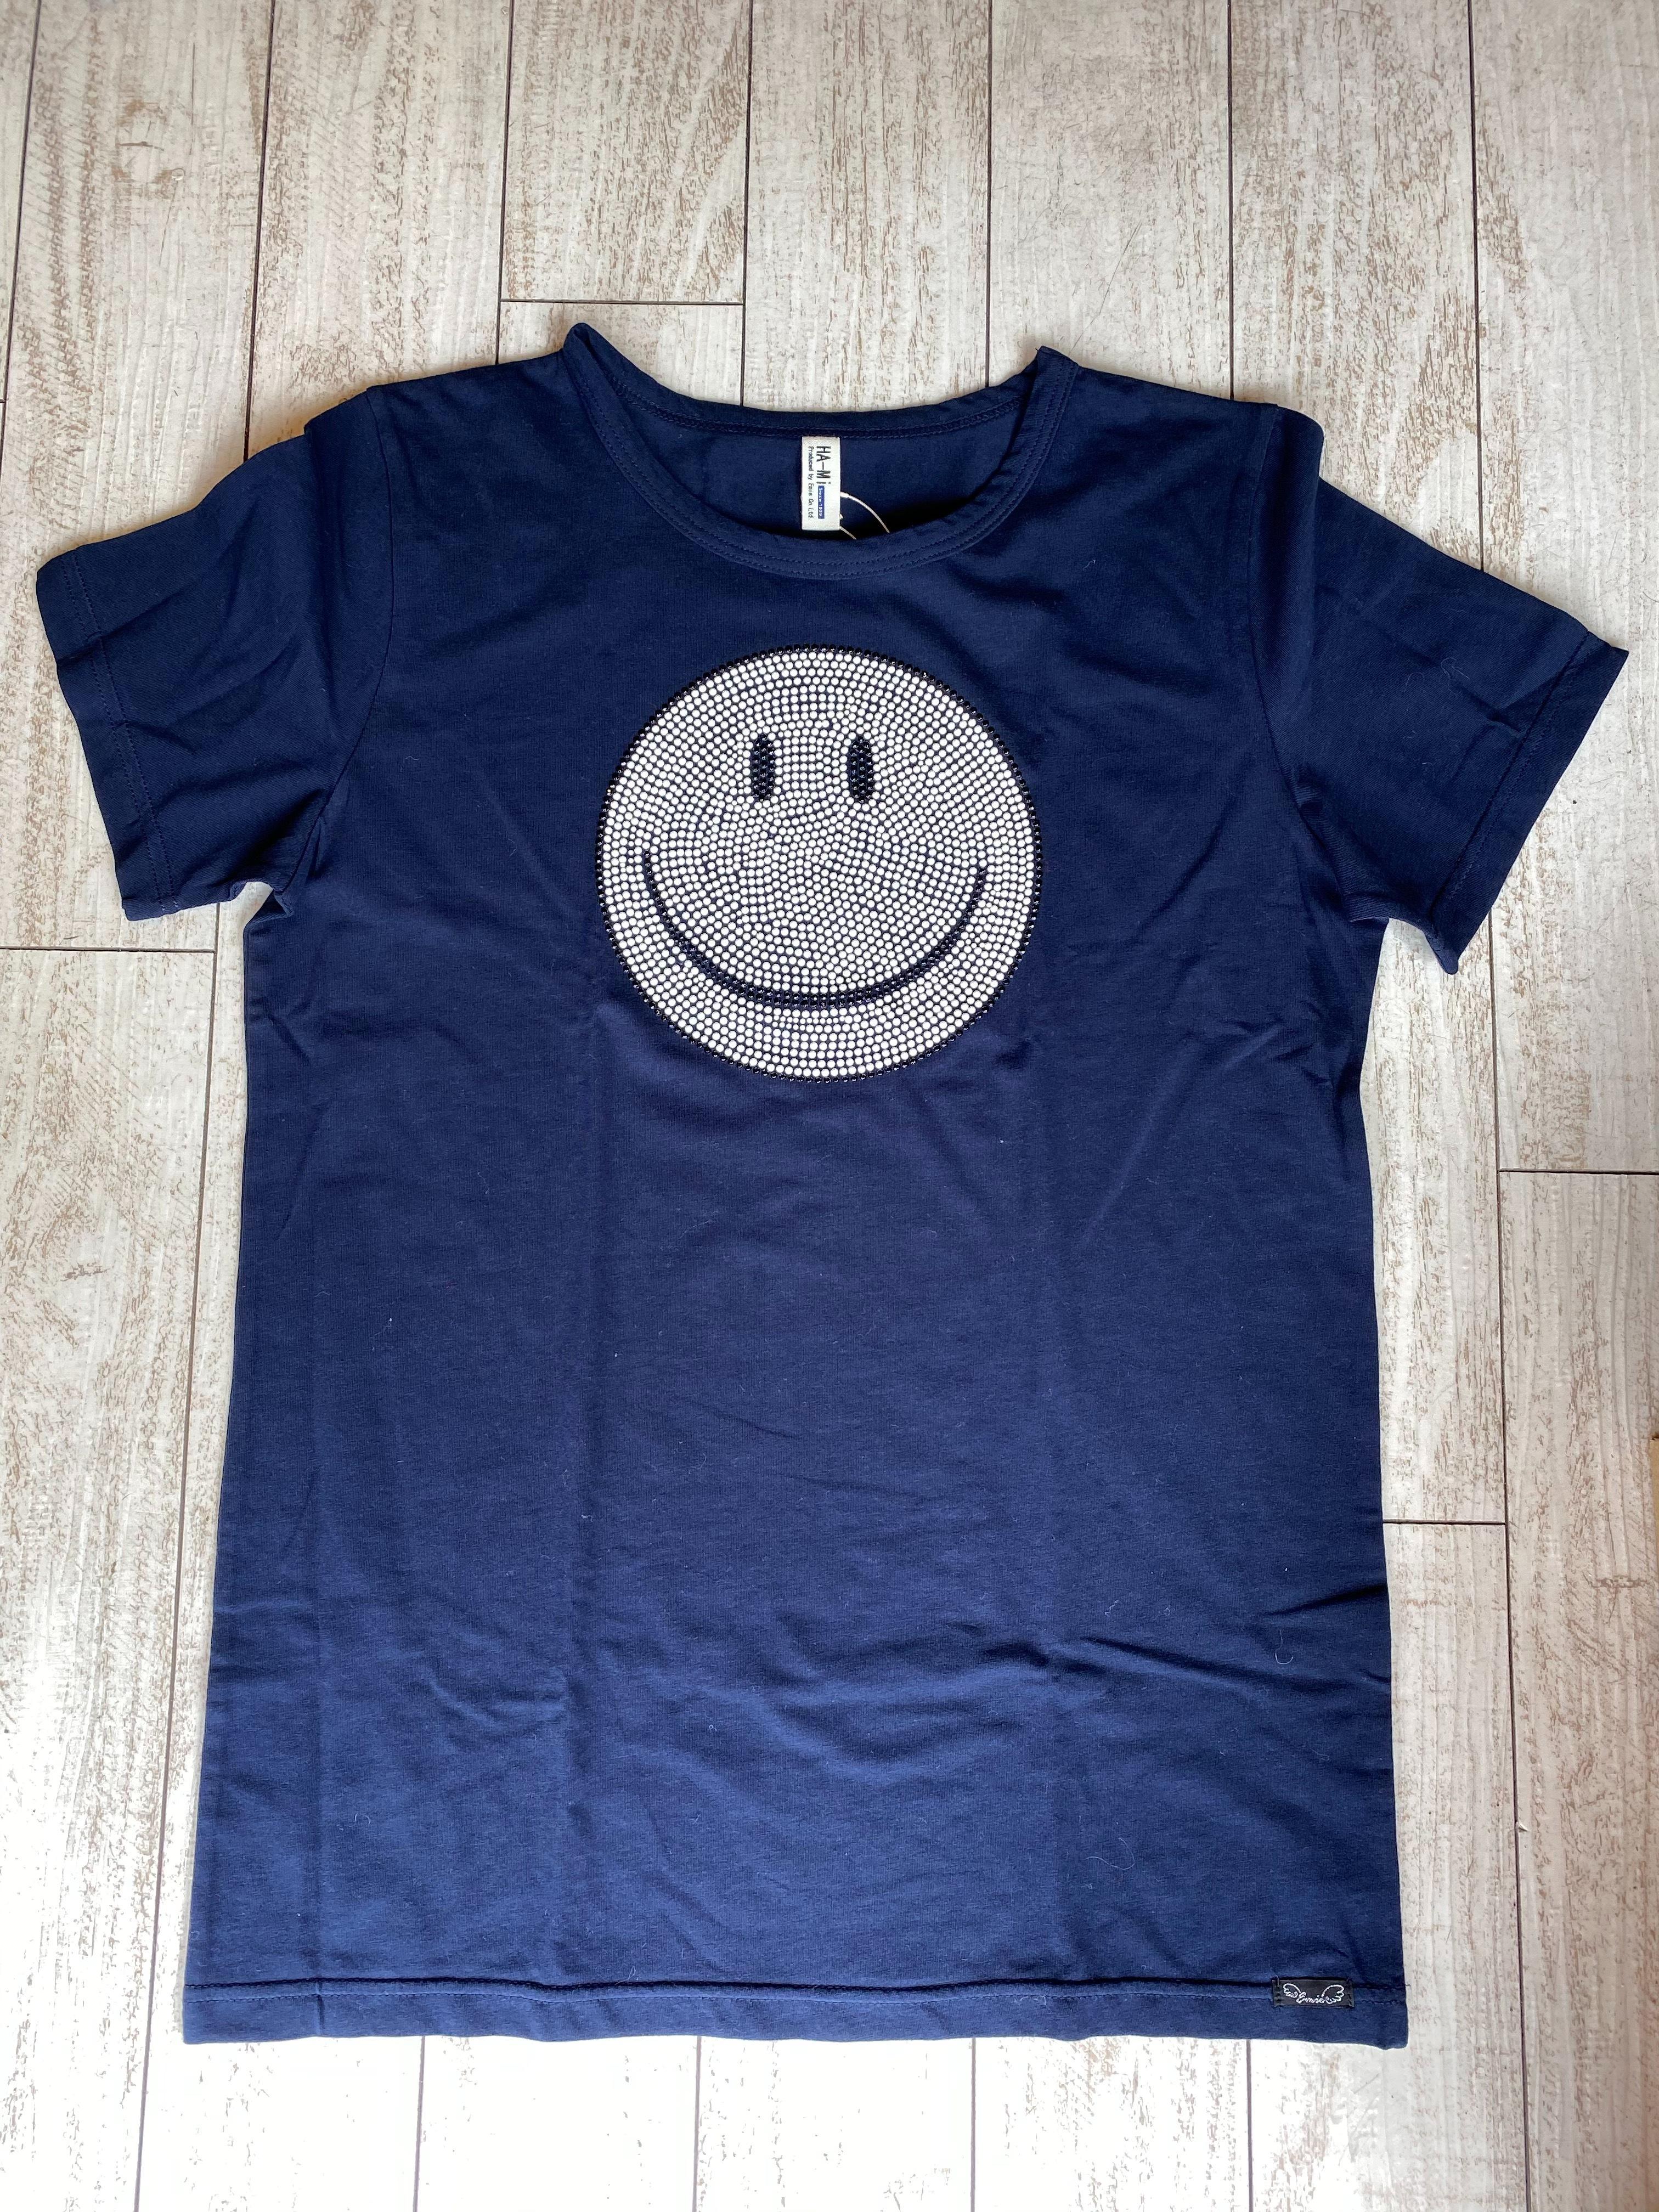 EmieオリジナルTシャツ(スマイル/ハート/クラウン)